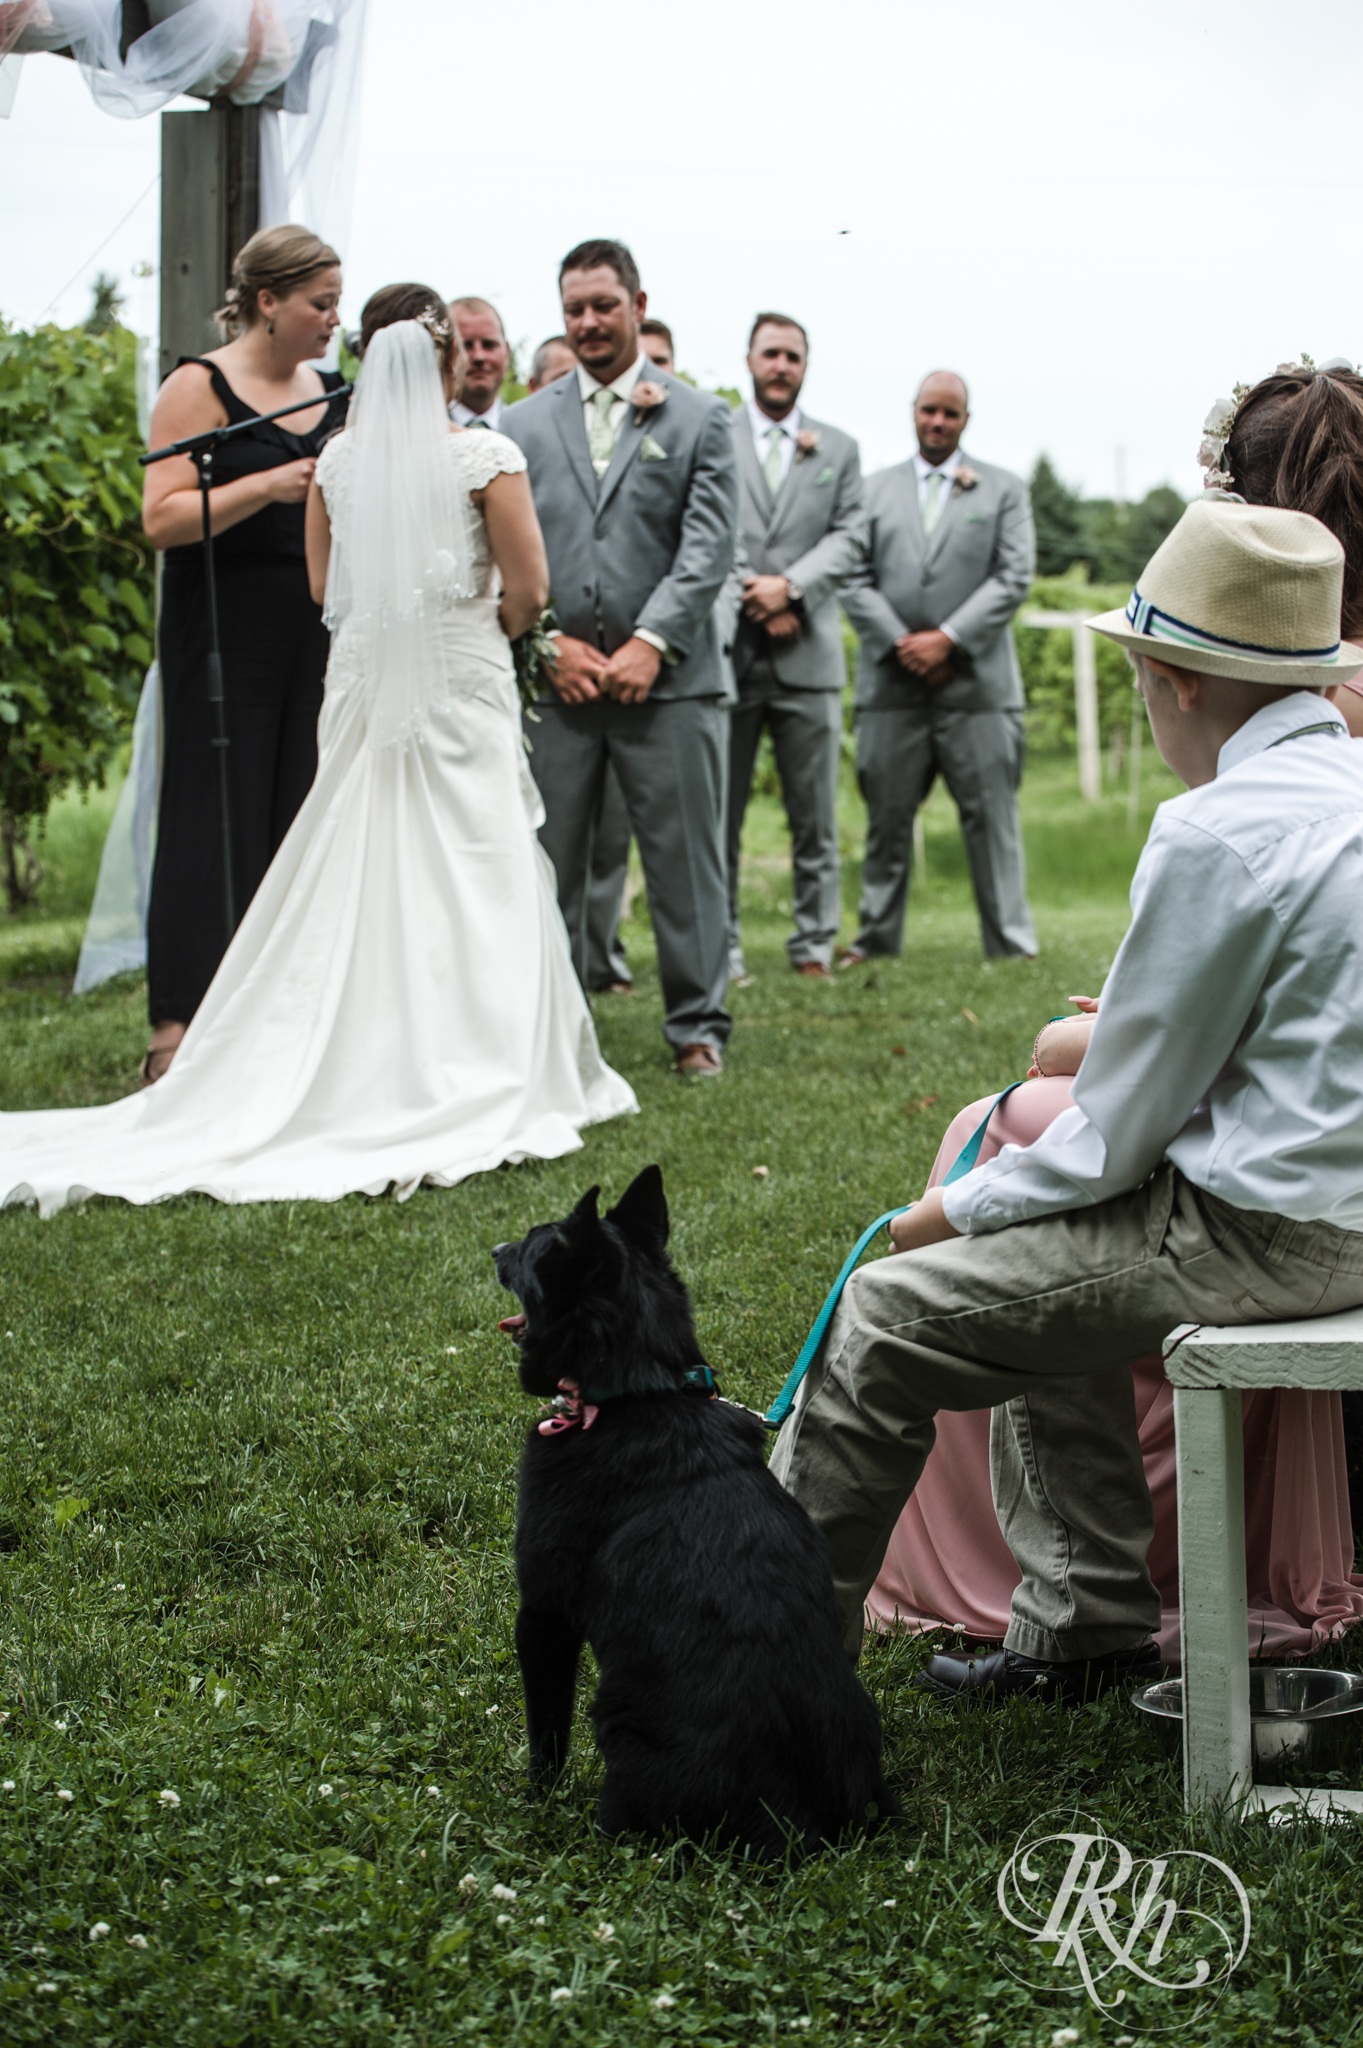 Ally & Nick - Minnesota Wedding Photography - Next Chapter Winery - RKH Images - Blog (20 of 57).jpg